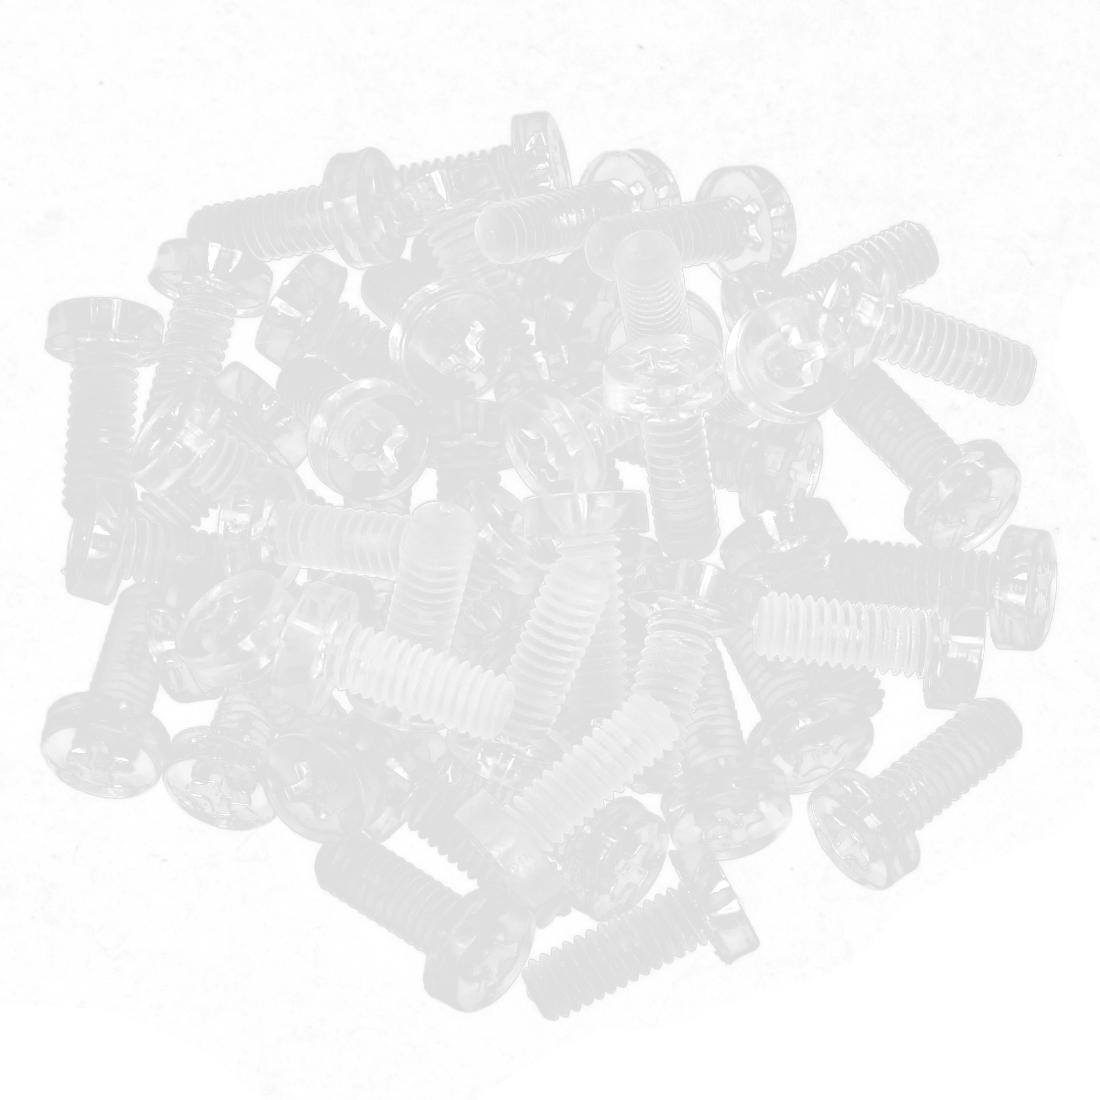 M4 x 10mm Clear Polymeric Carbon Phillips Pan Head Machine Screws 50pcs